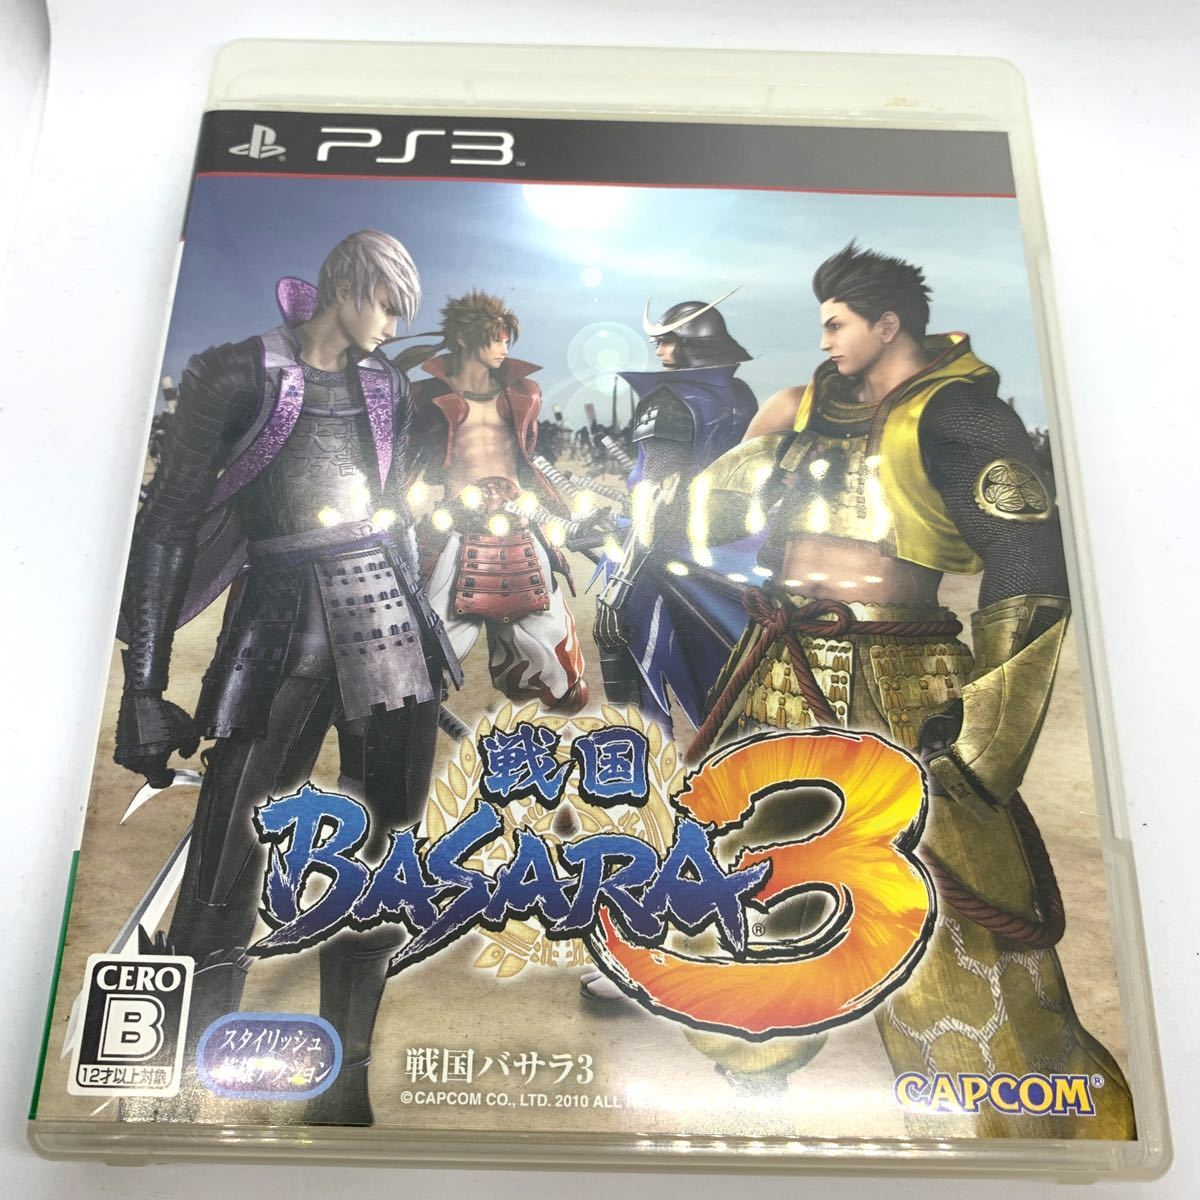 【PS3】 戦国BASARA3 [通常版]カプコン CAPCOM ゲーム